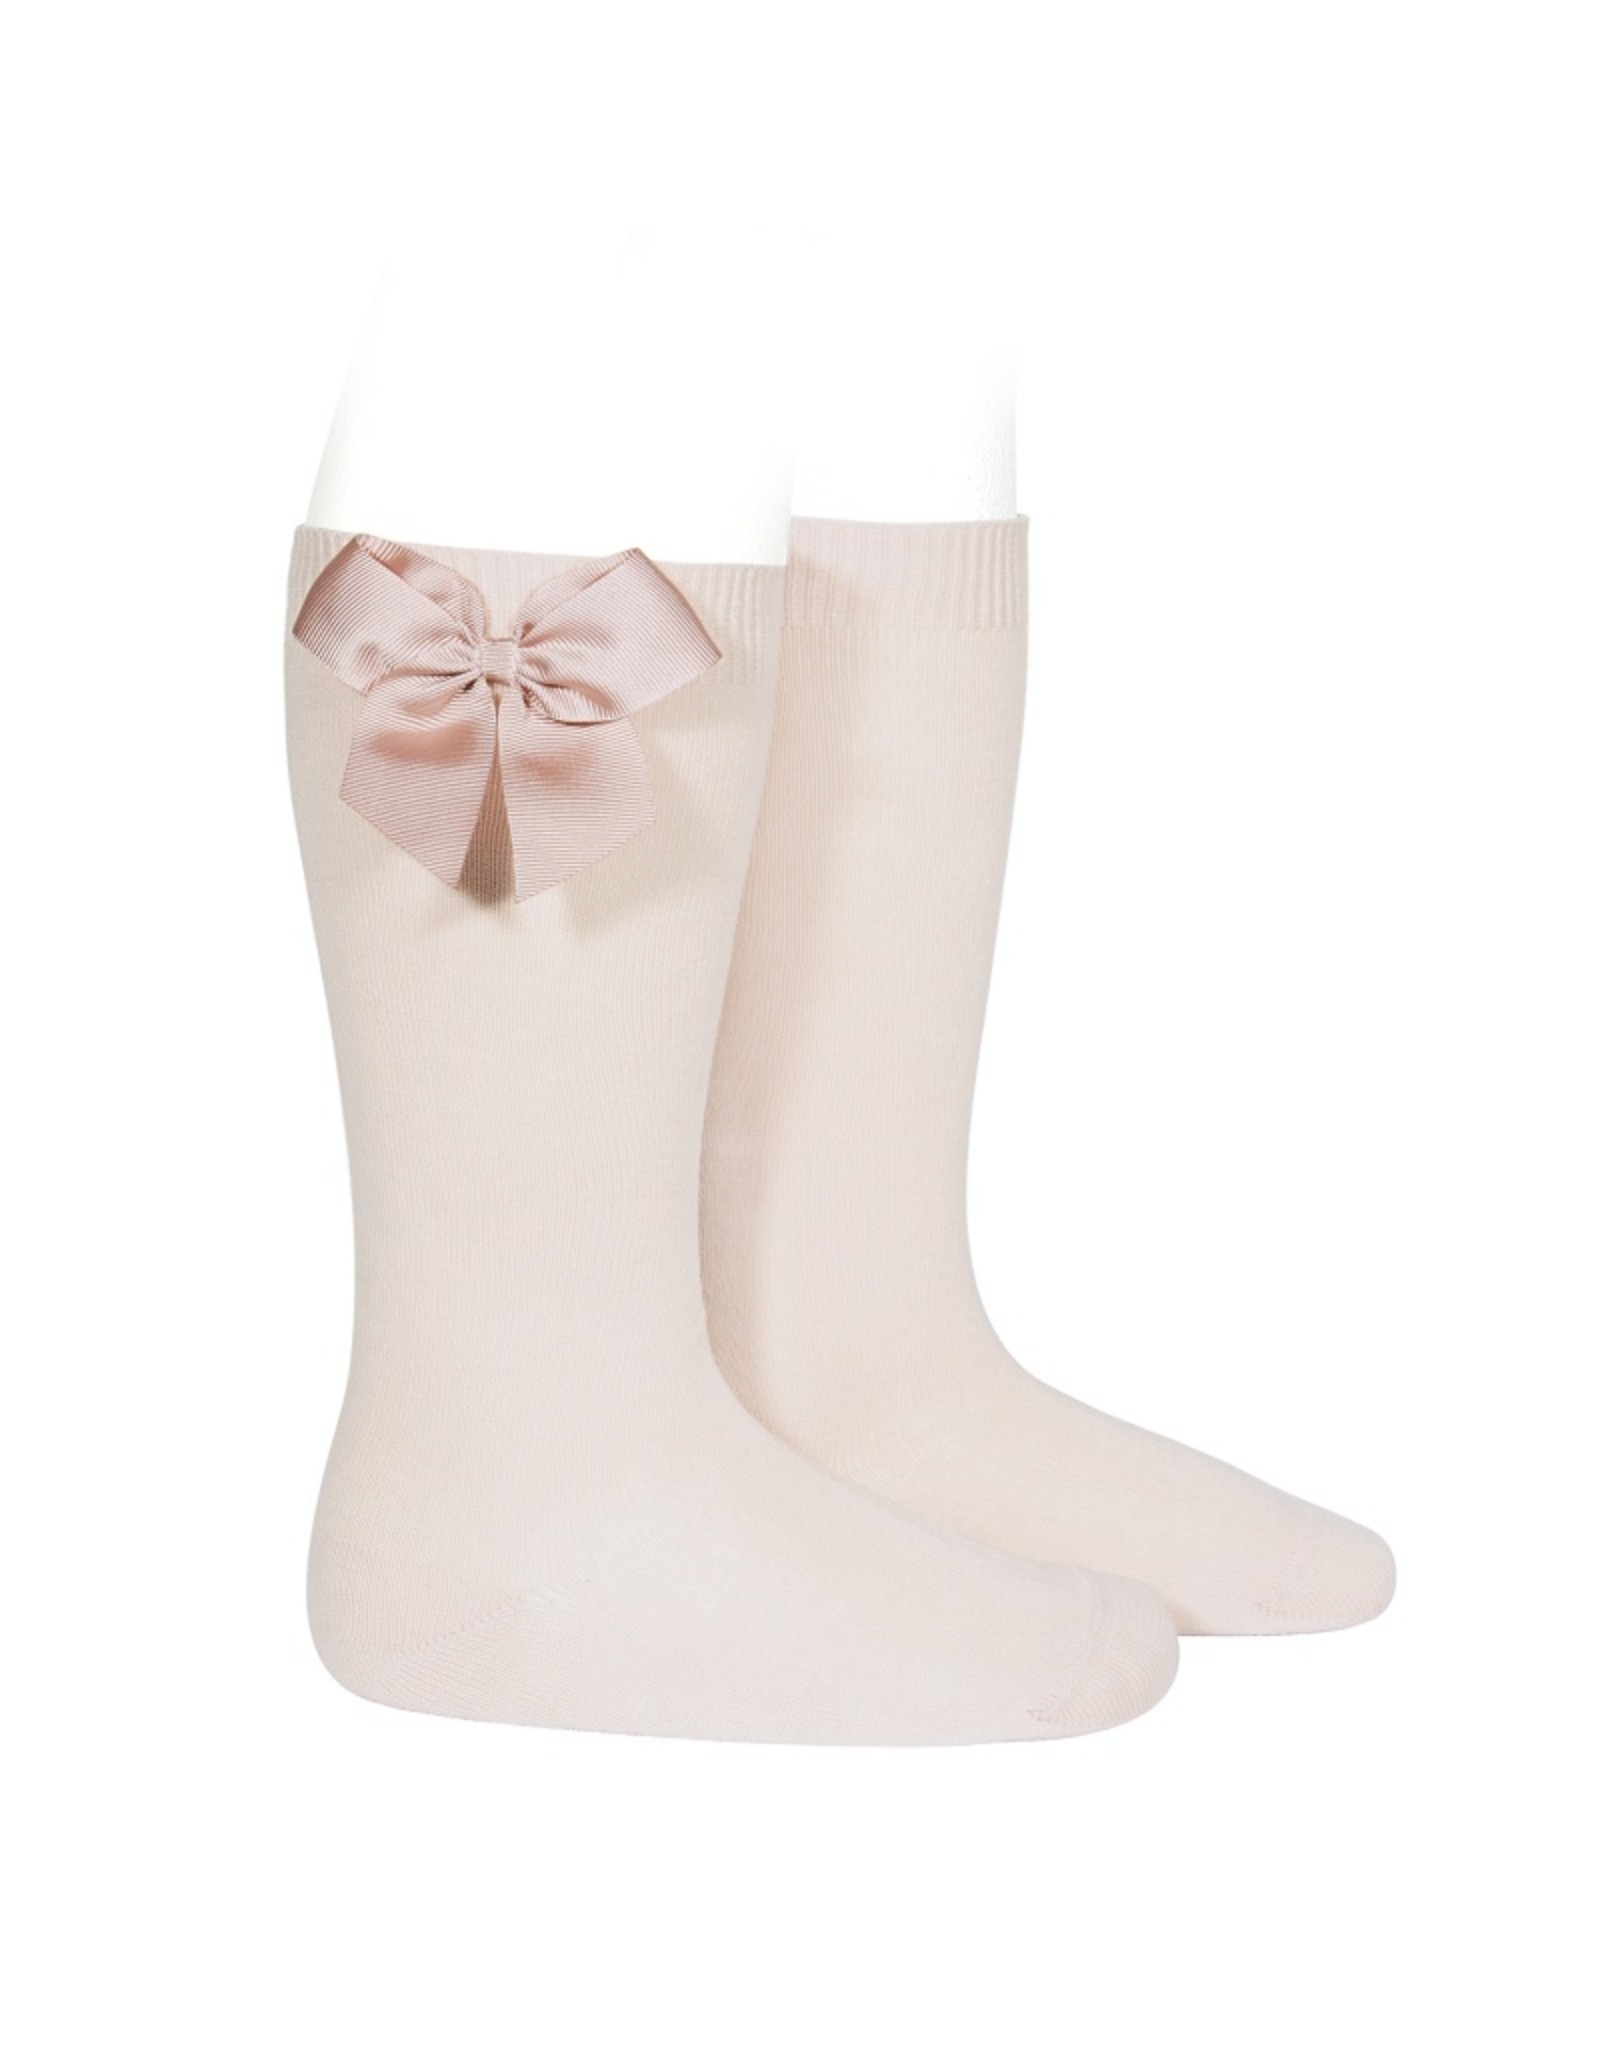 CONDOR Nude Knee Socks with Bow